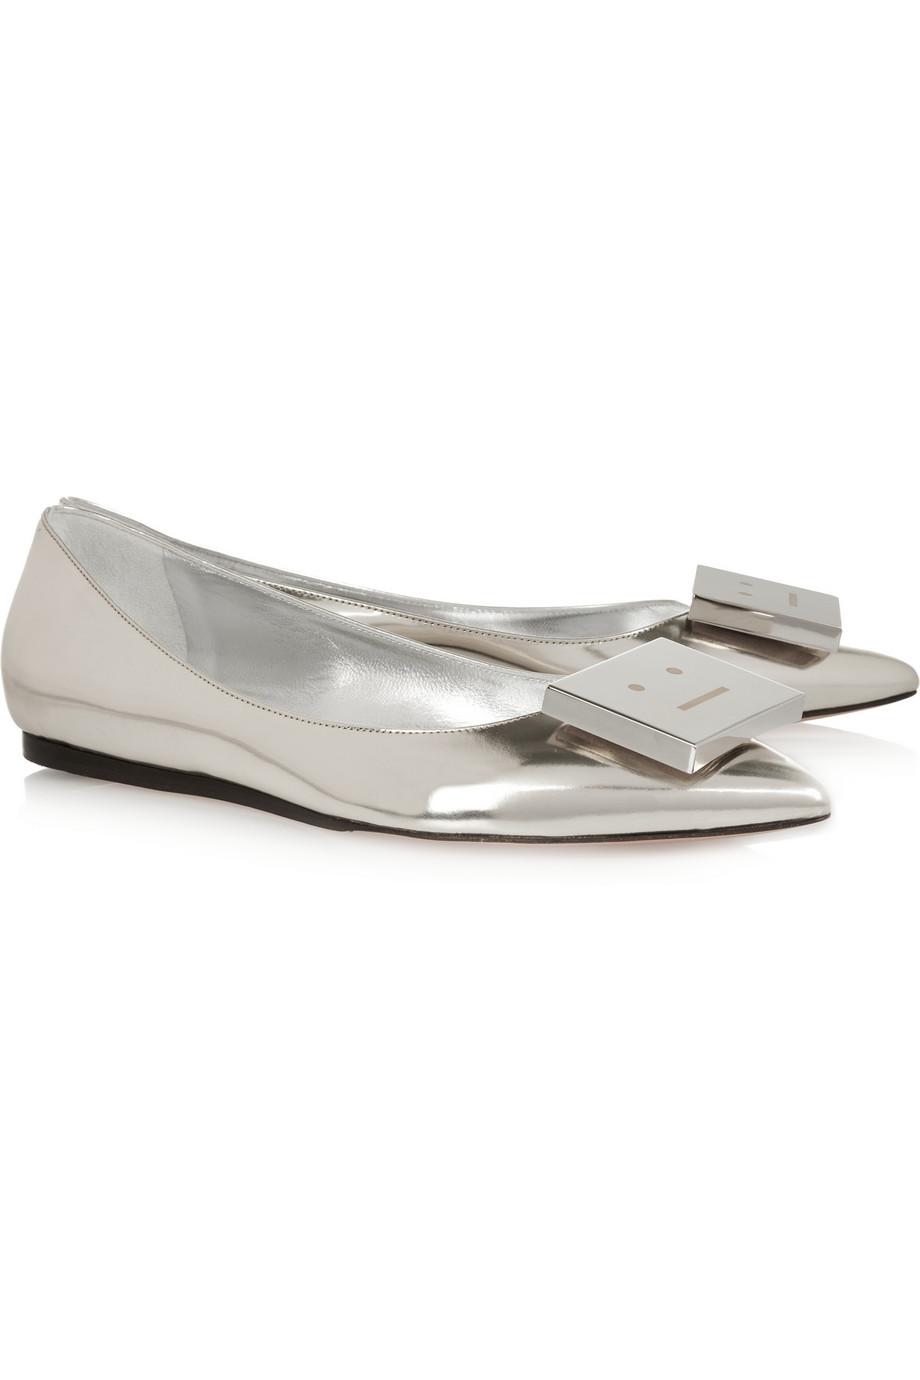 Acne Studios metallic leather point-toe flats